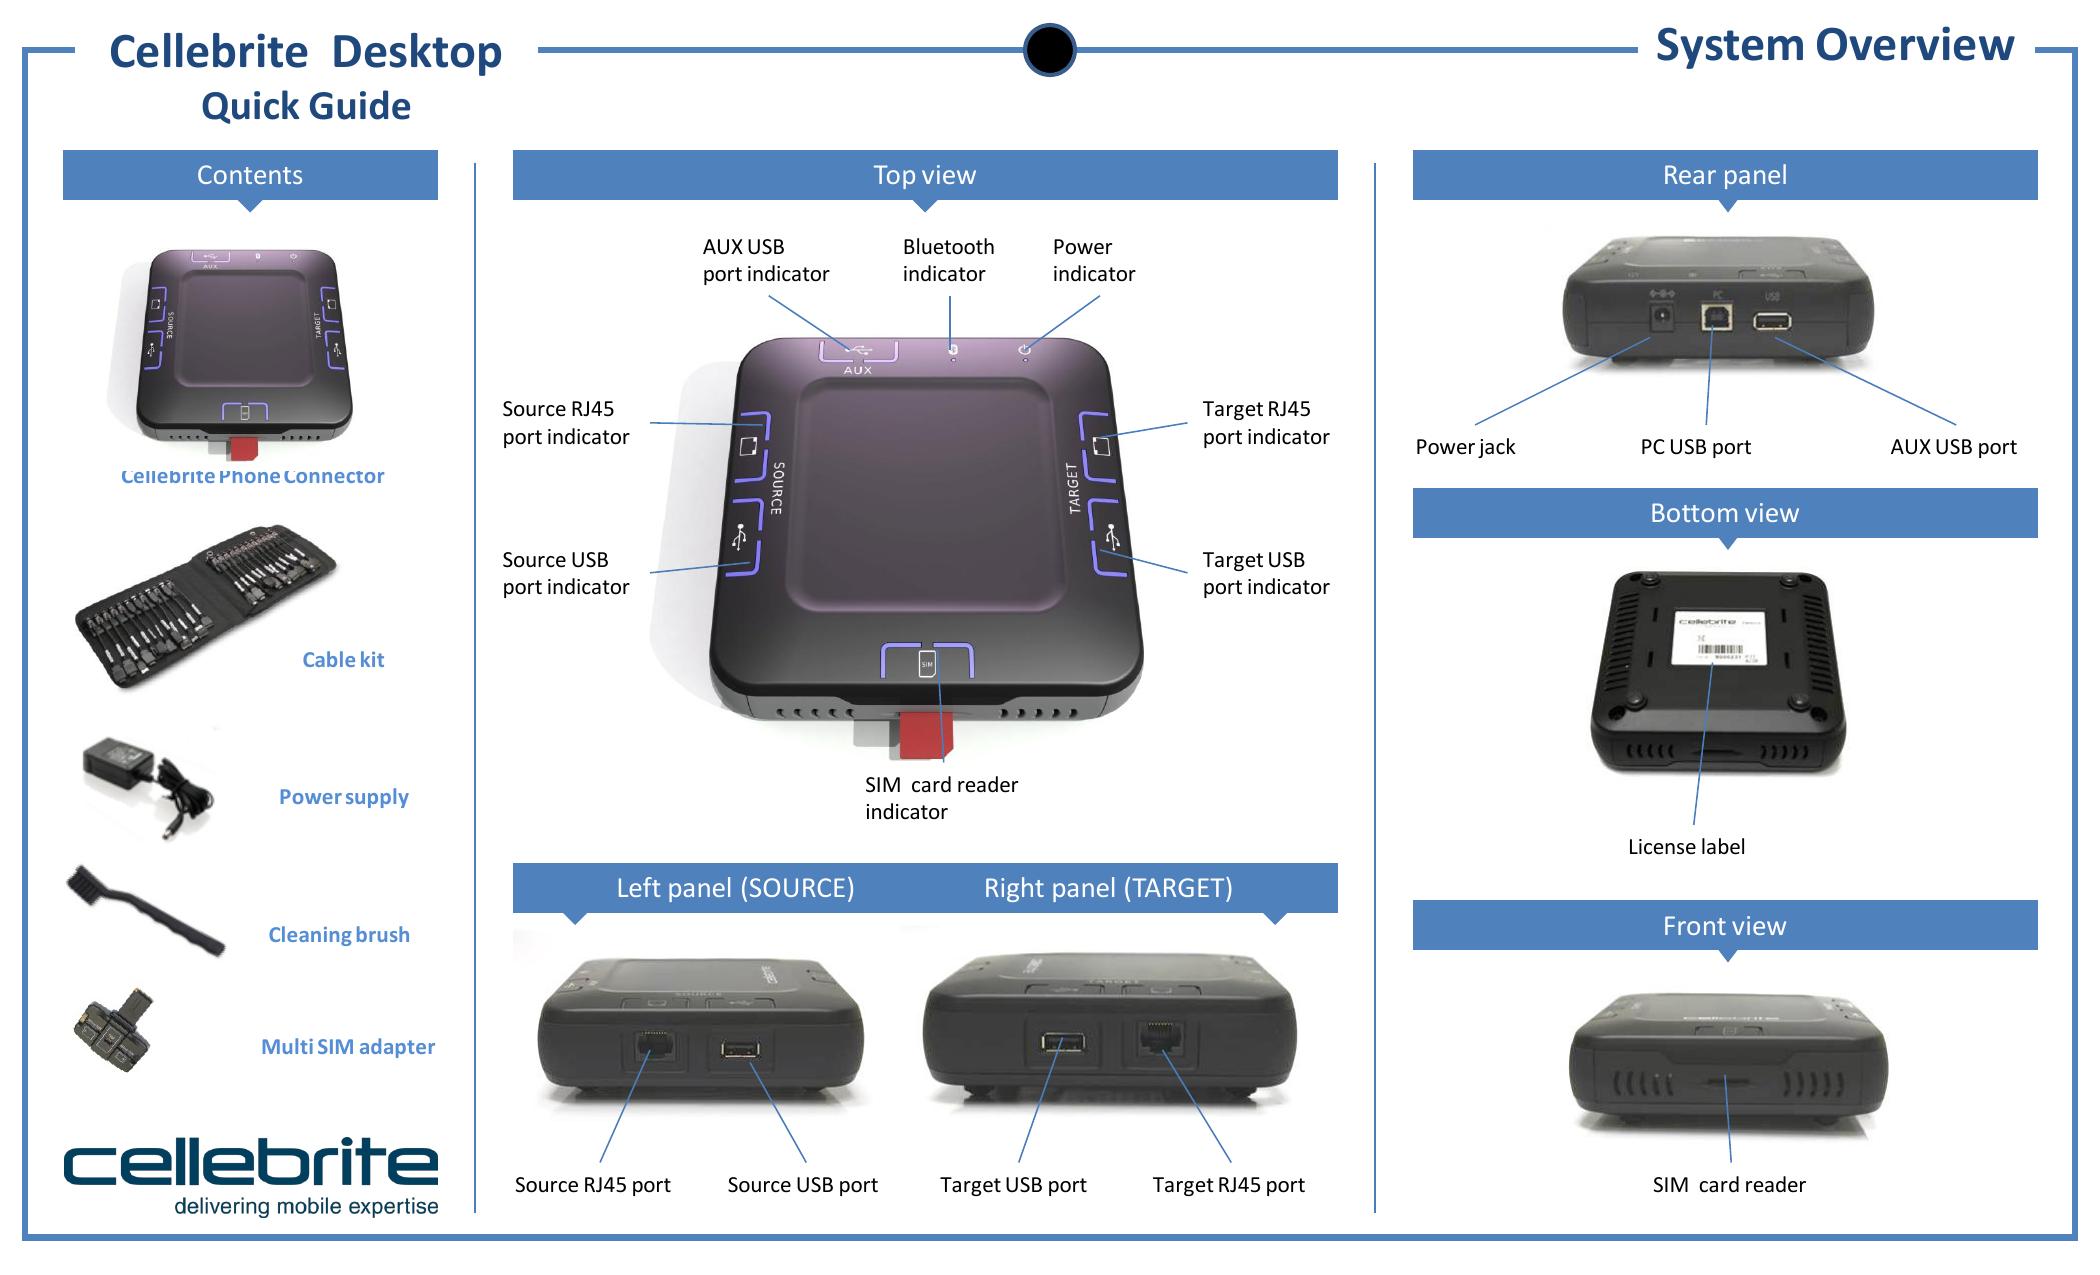 Cellebrite DeskTop Quickguide | manualzz com